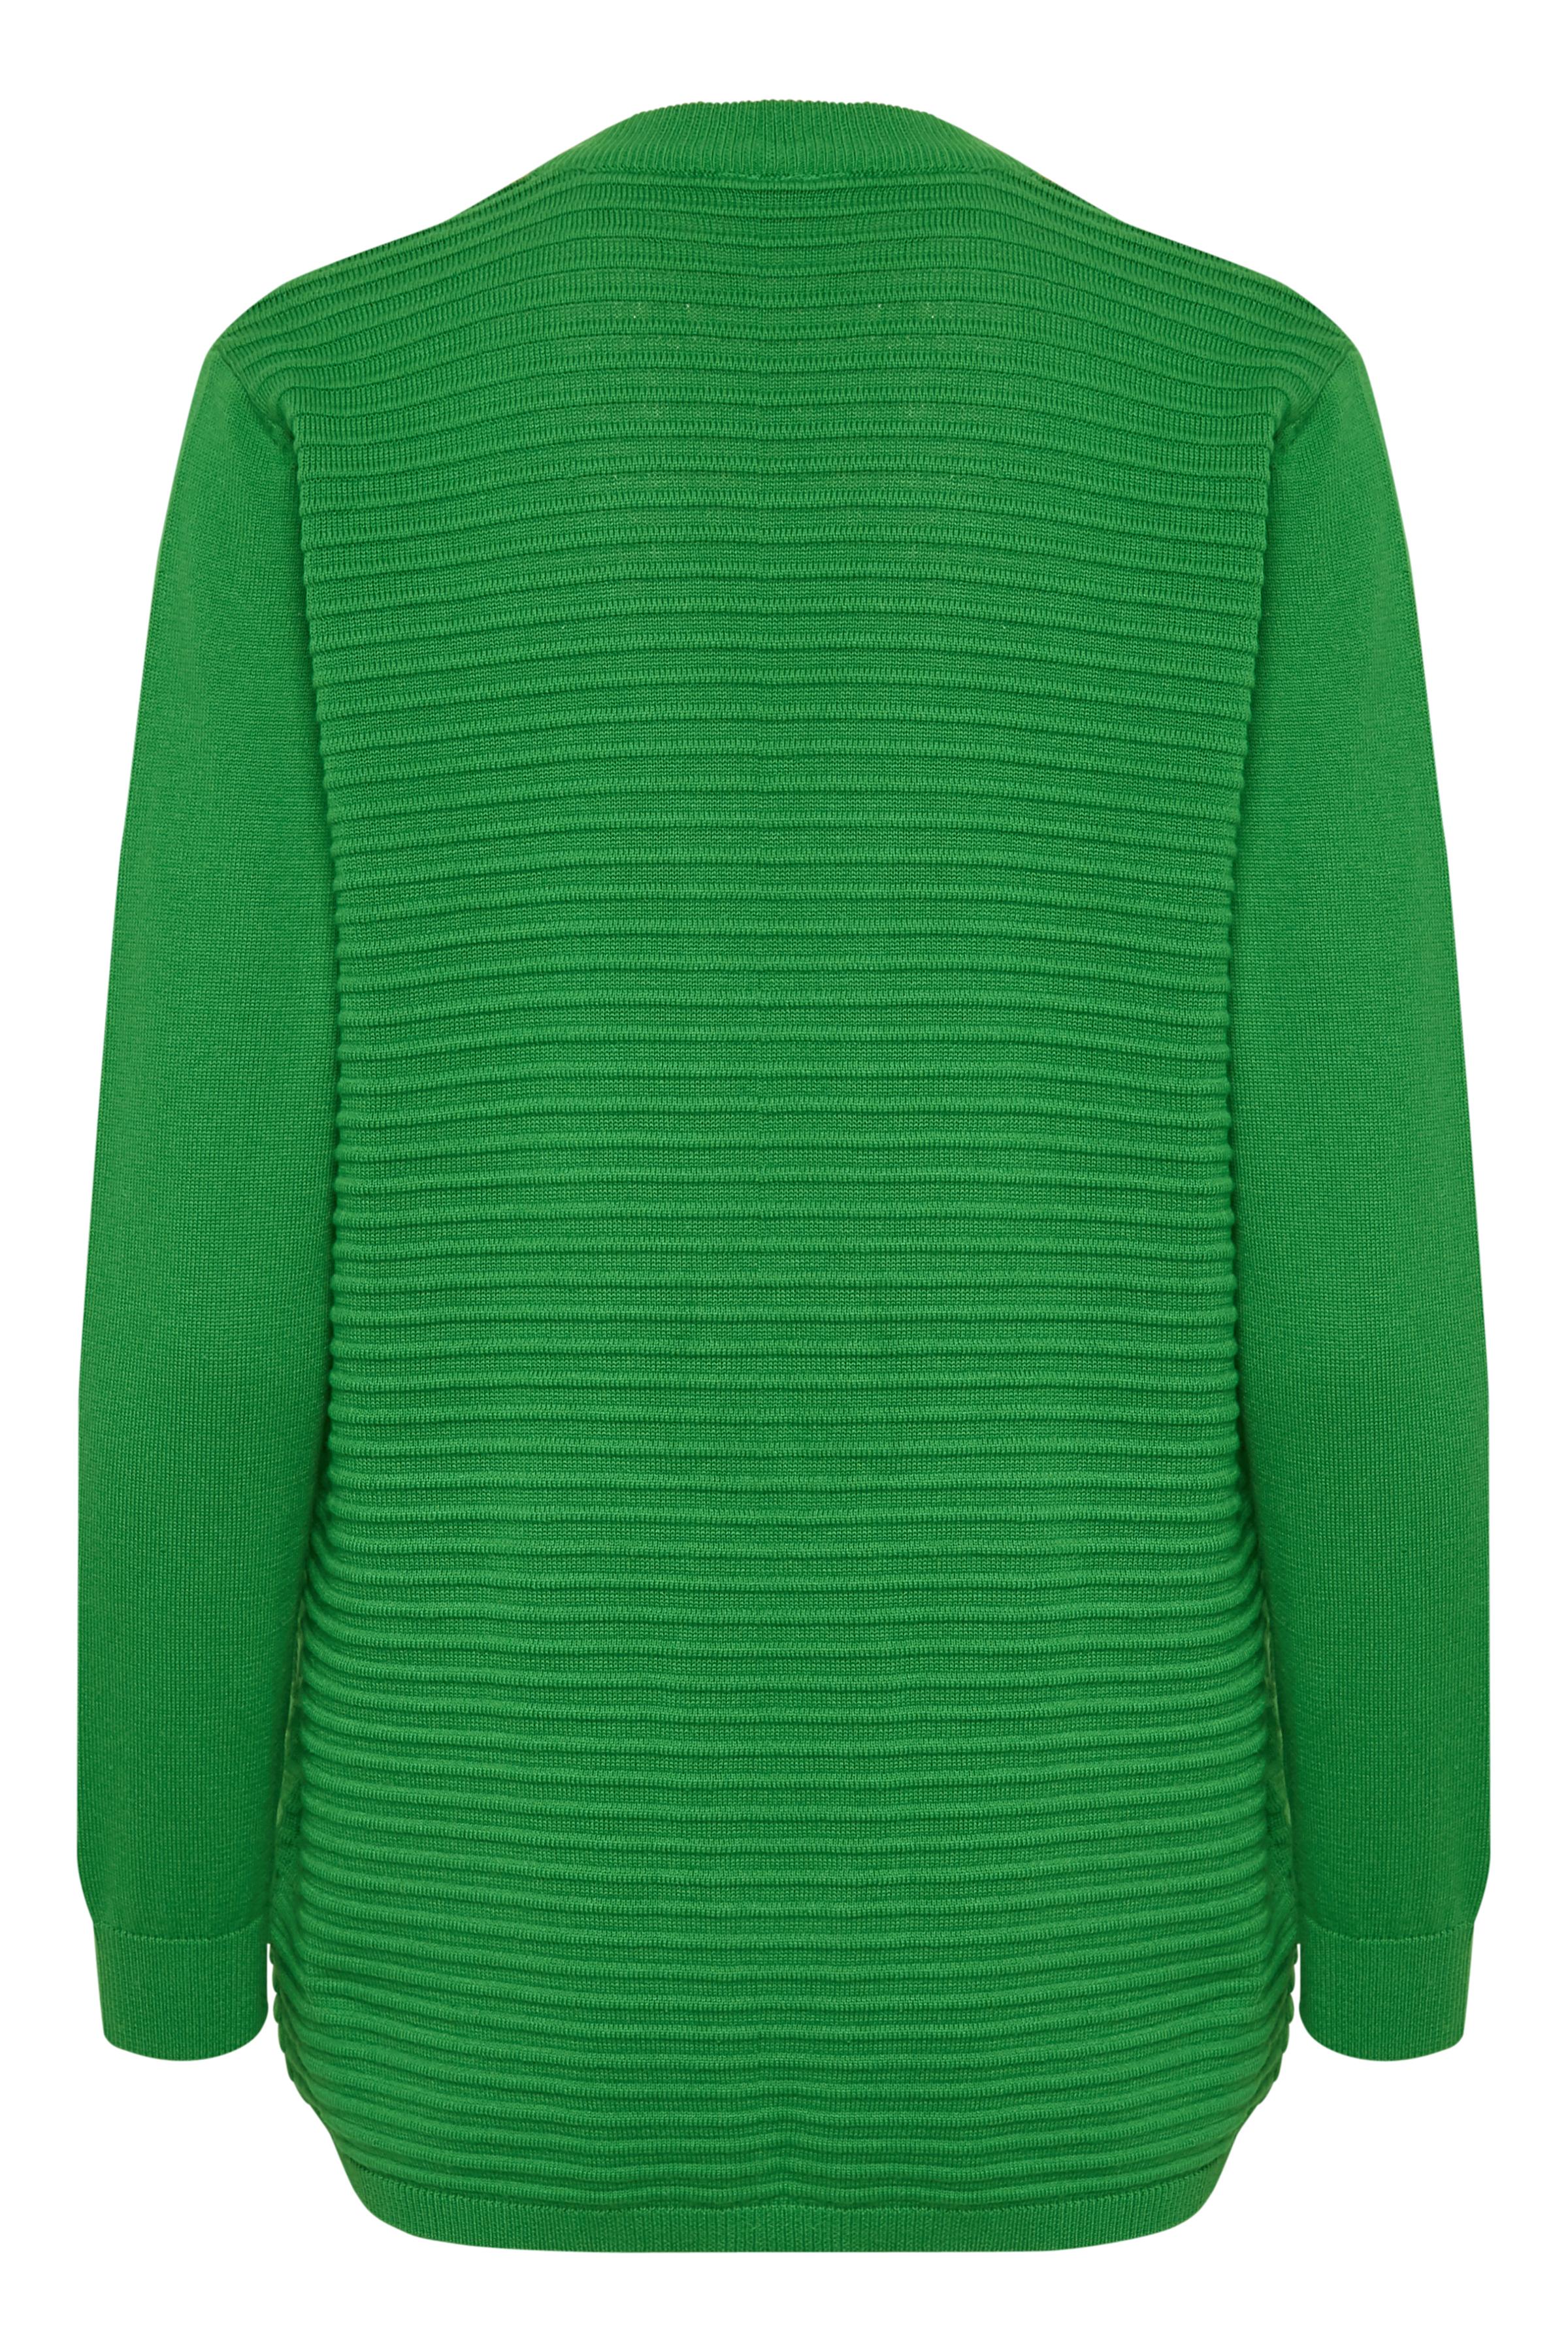 Grön Stickad cardigan från Fransa – Köp Grön Stickad cardigan från stl. XS-XXL här